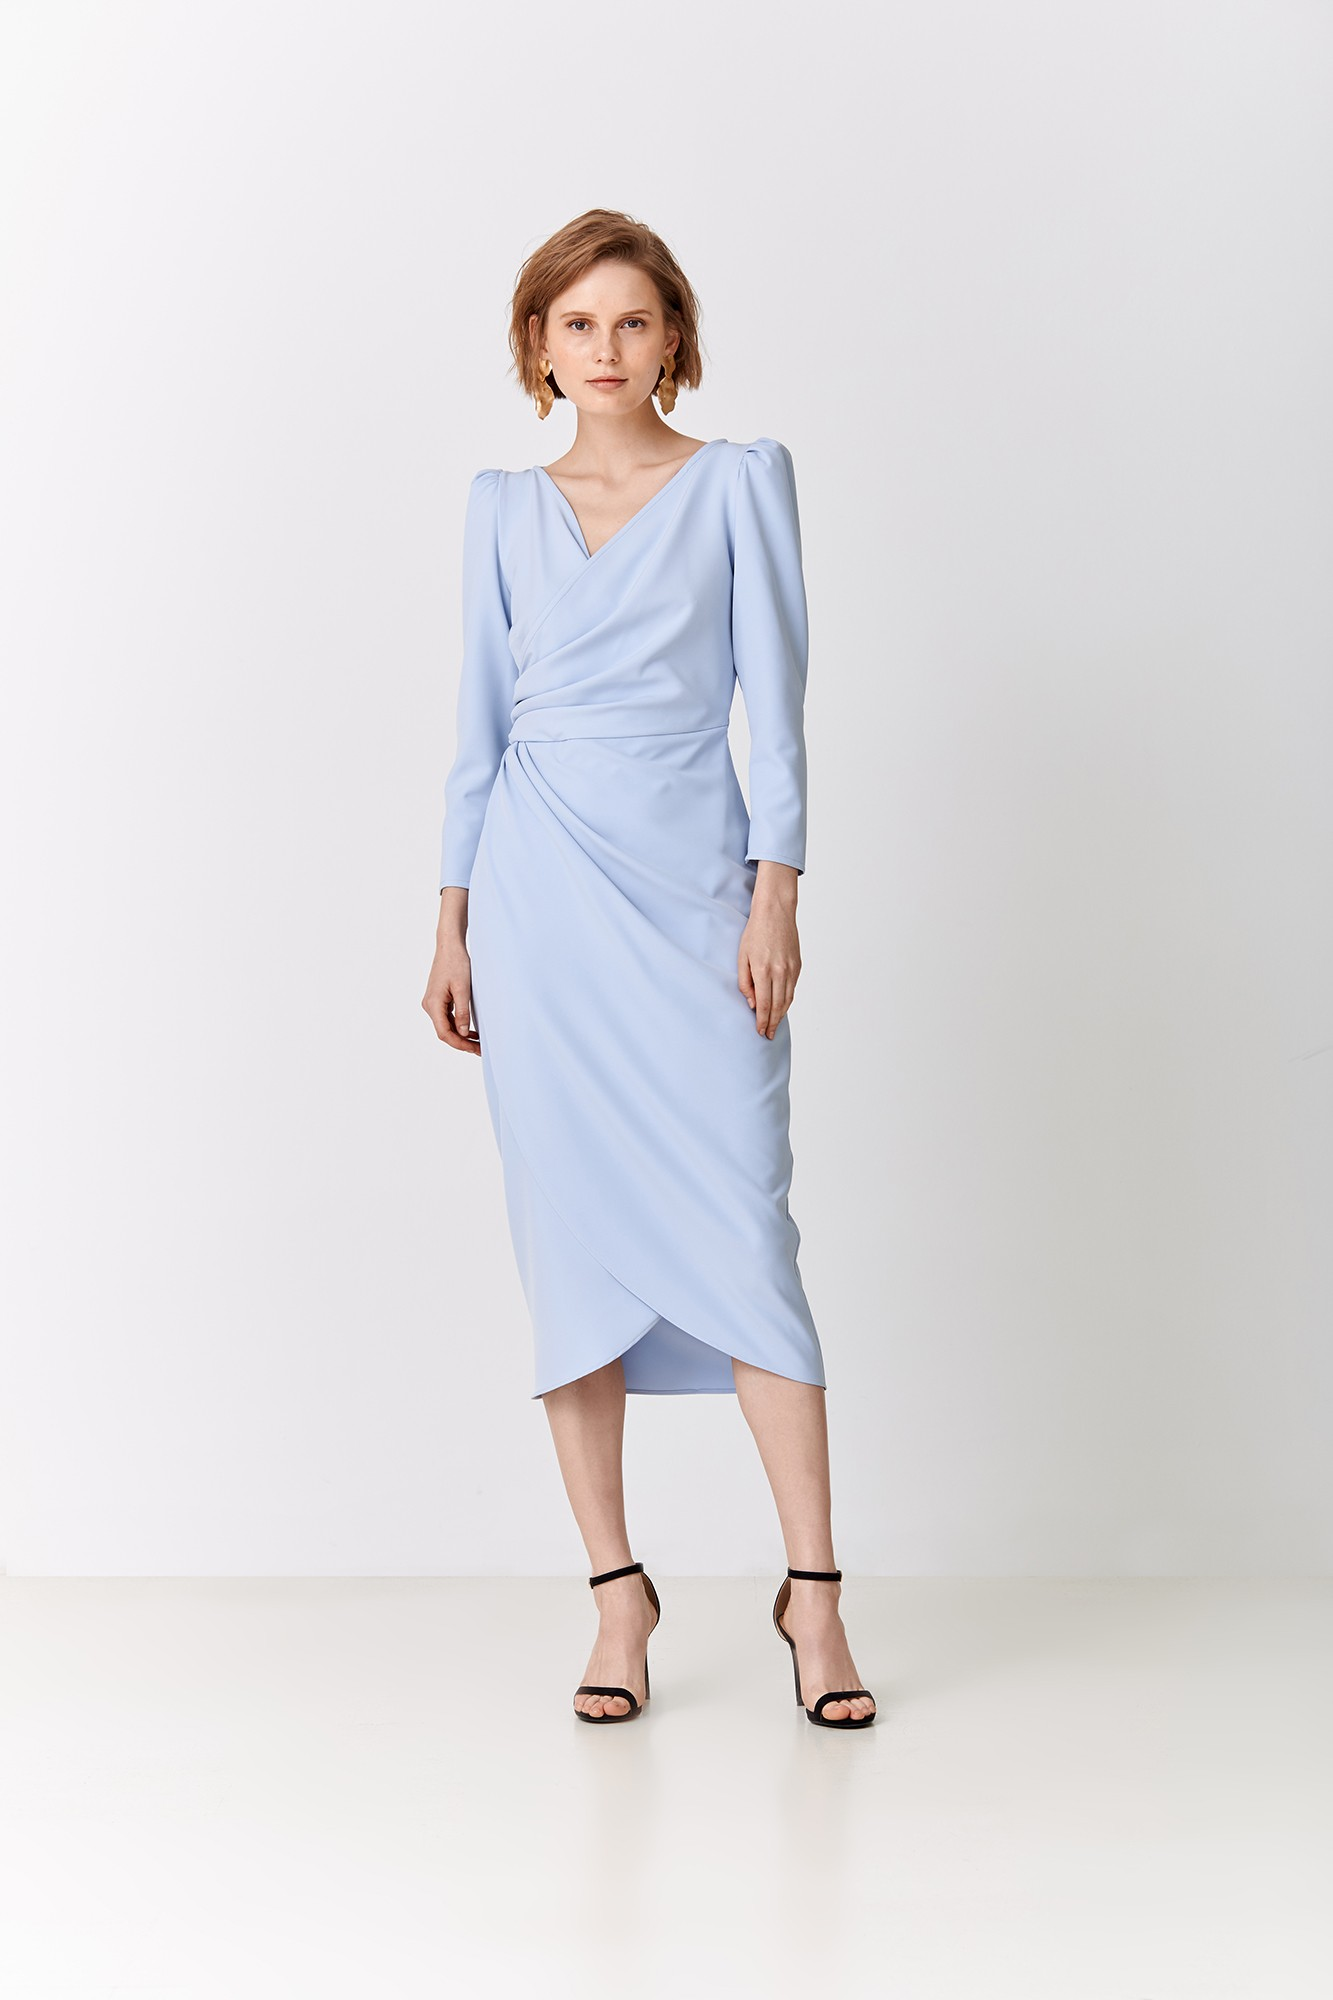 DAYLE BLUE DRESS